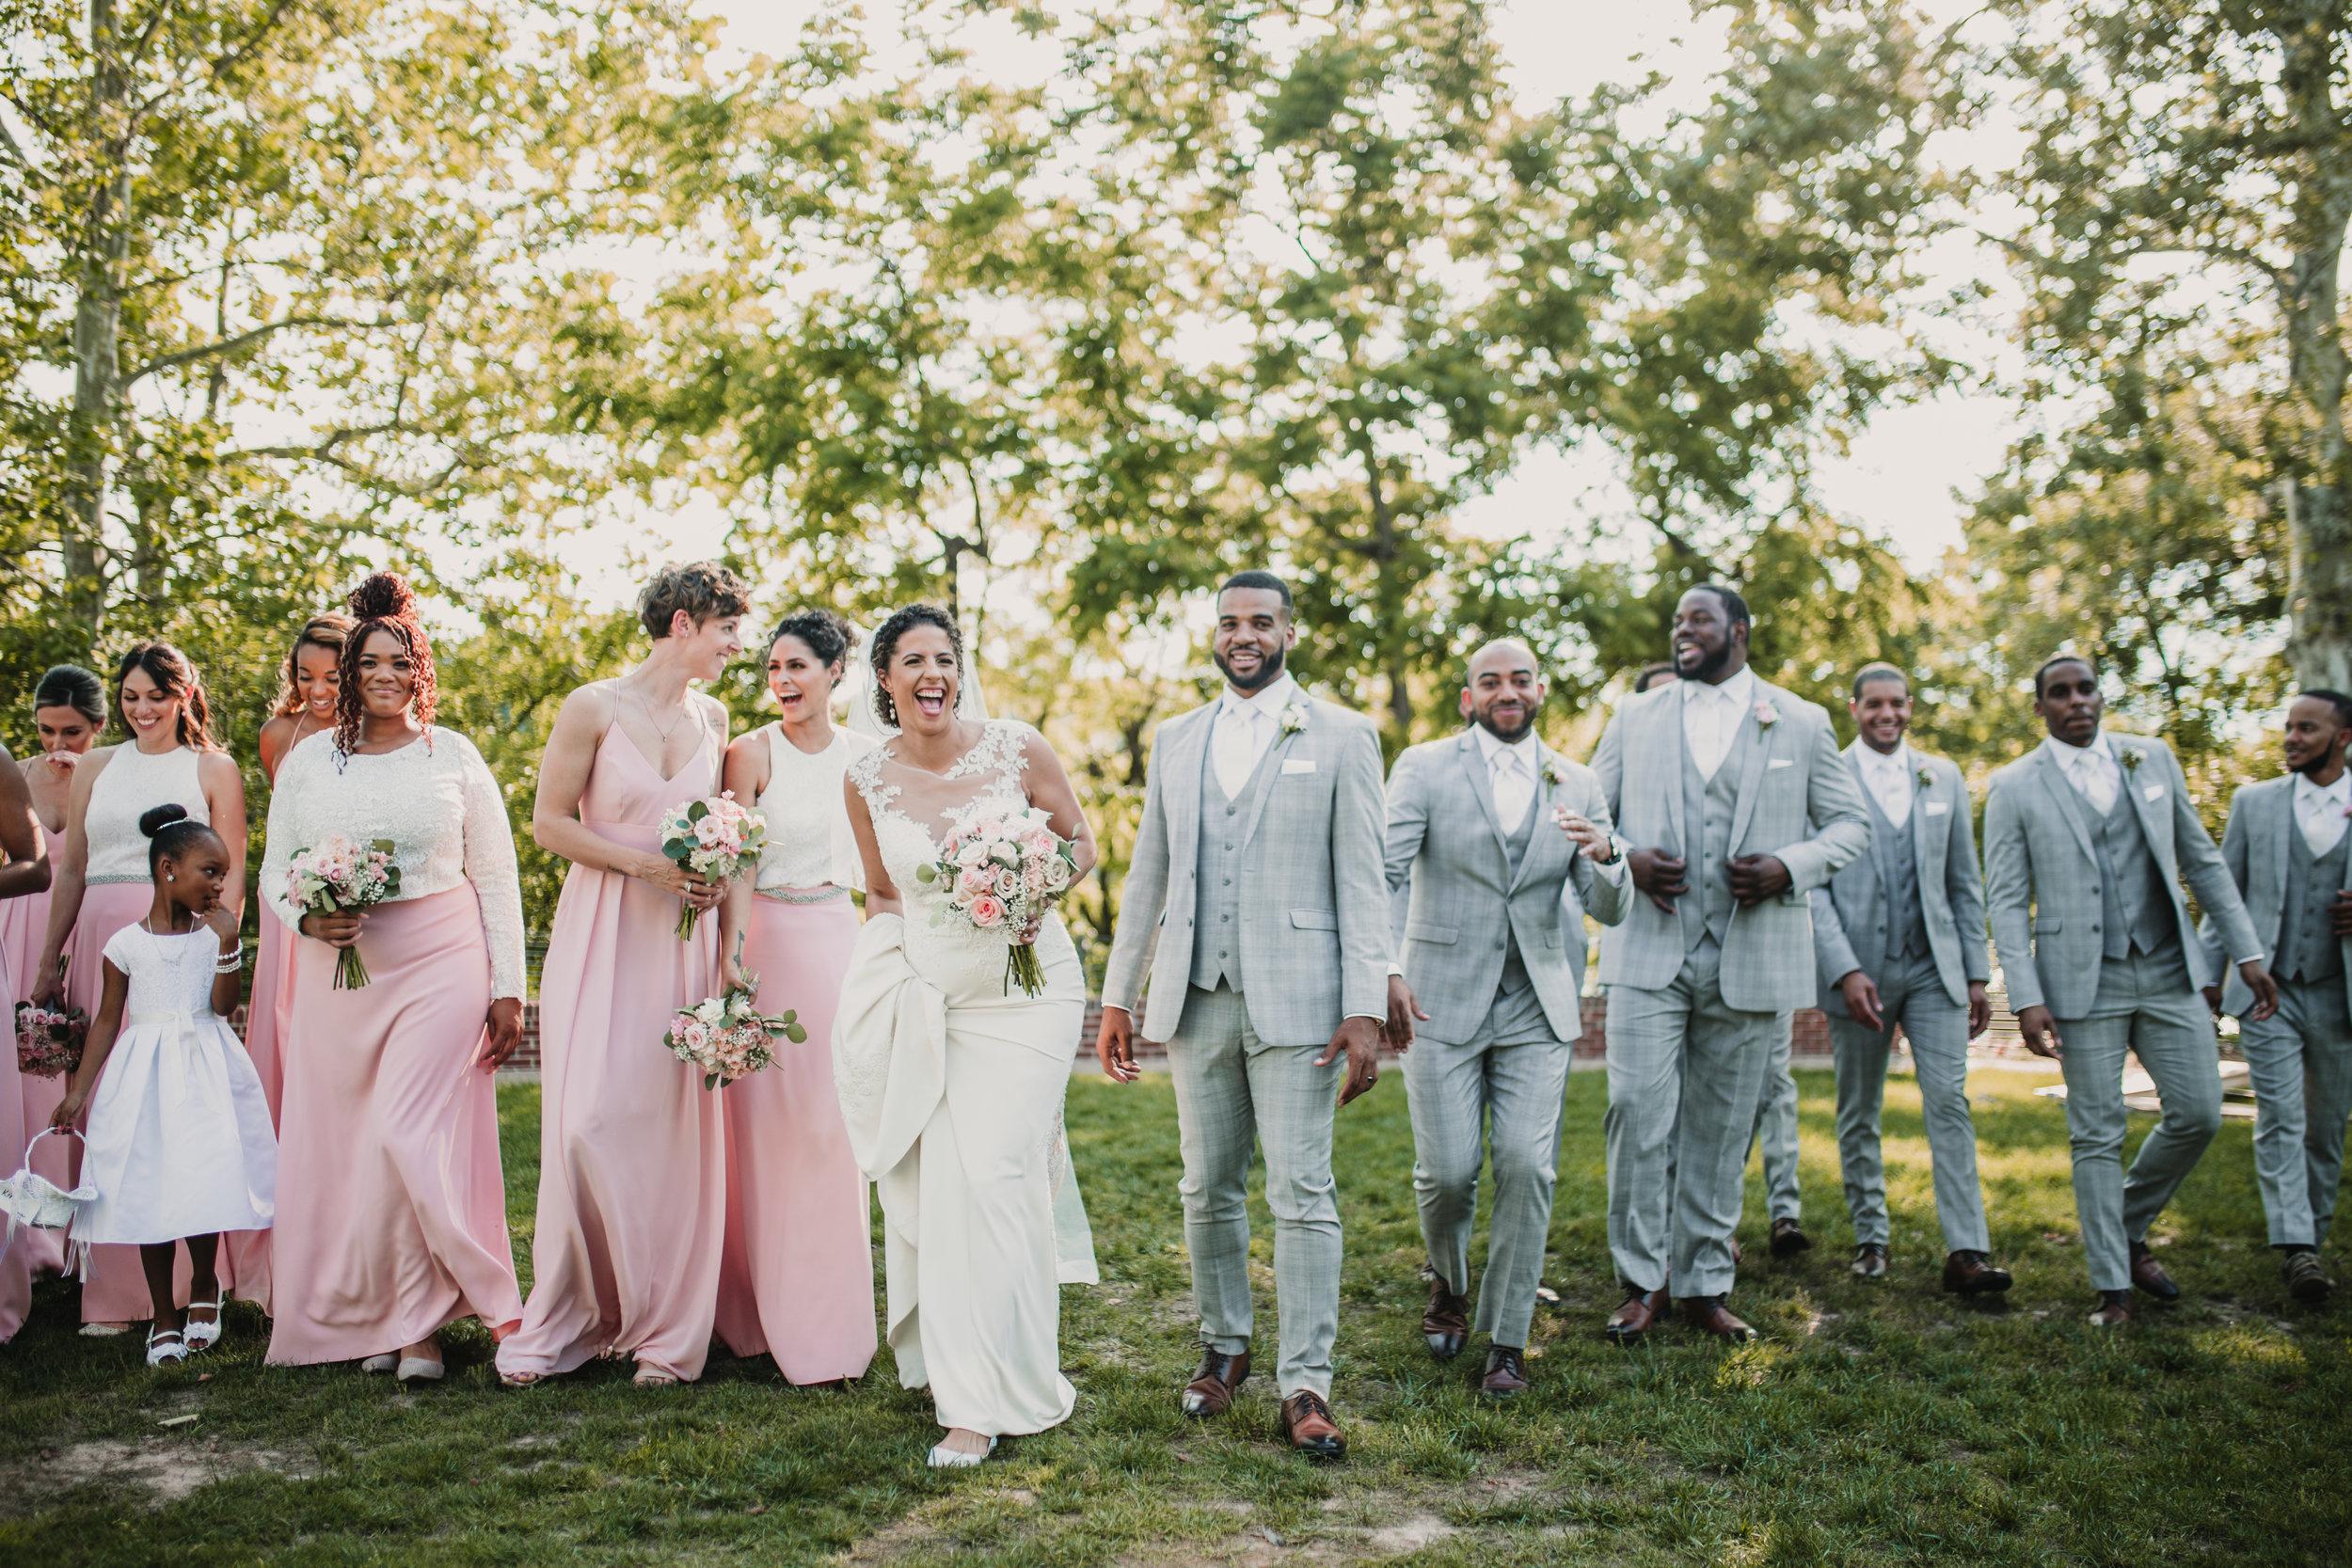 kendra_cameron_wedding(285of783).jpg